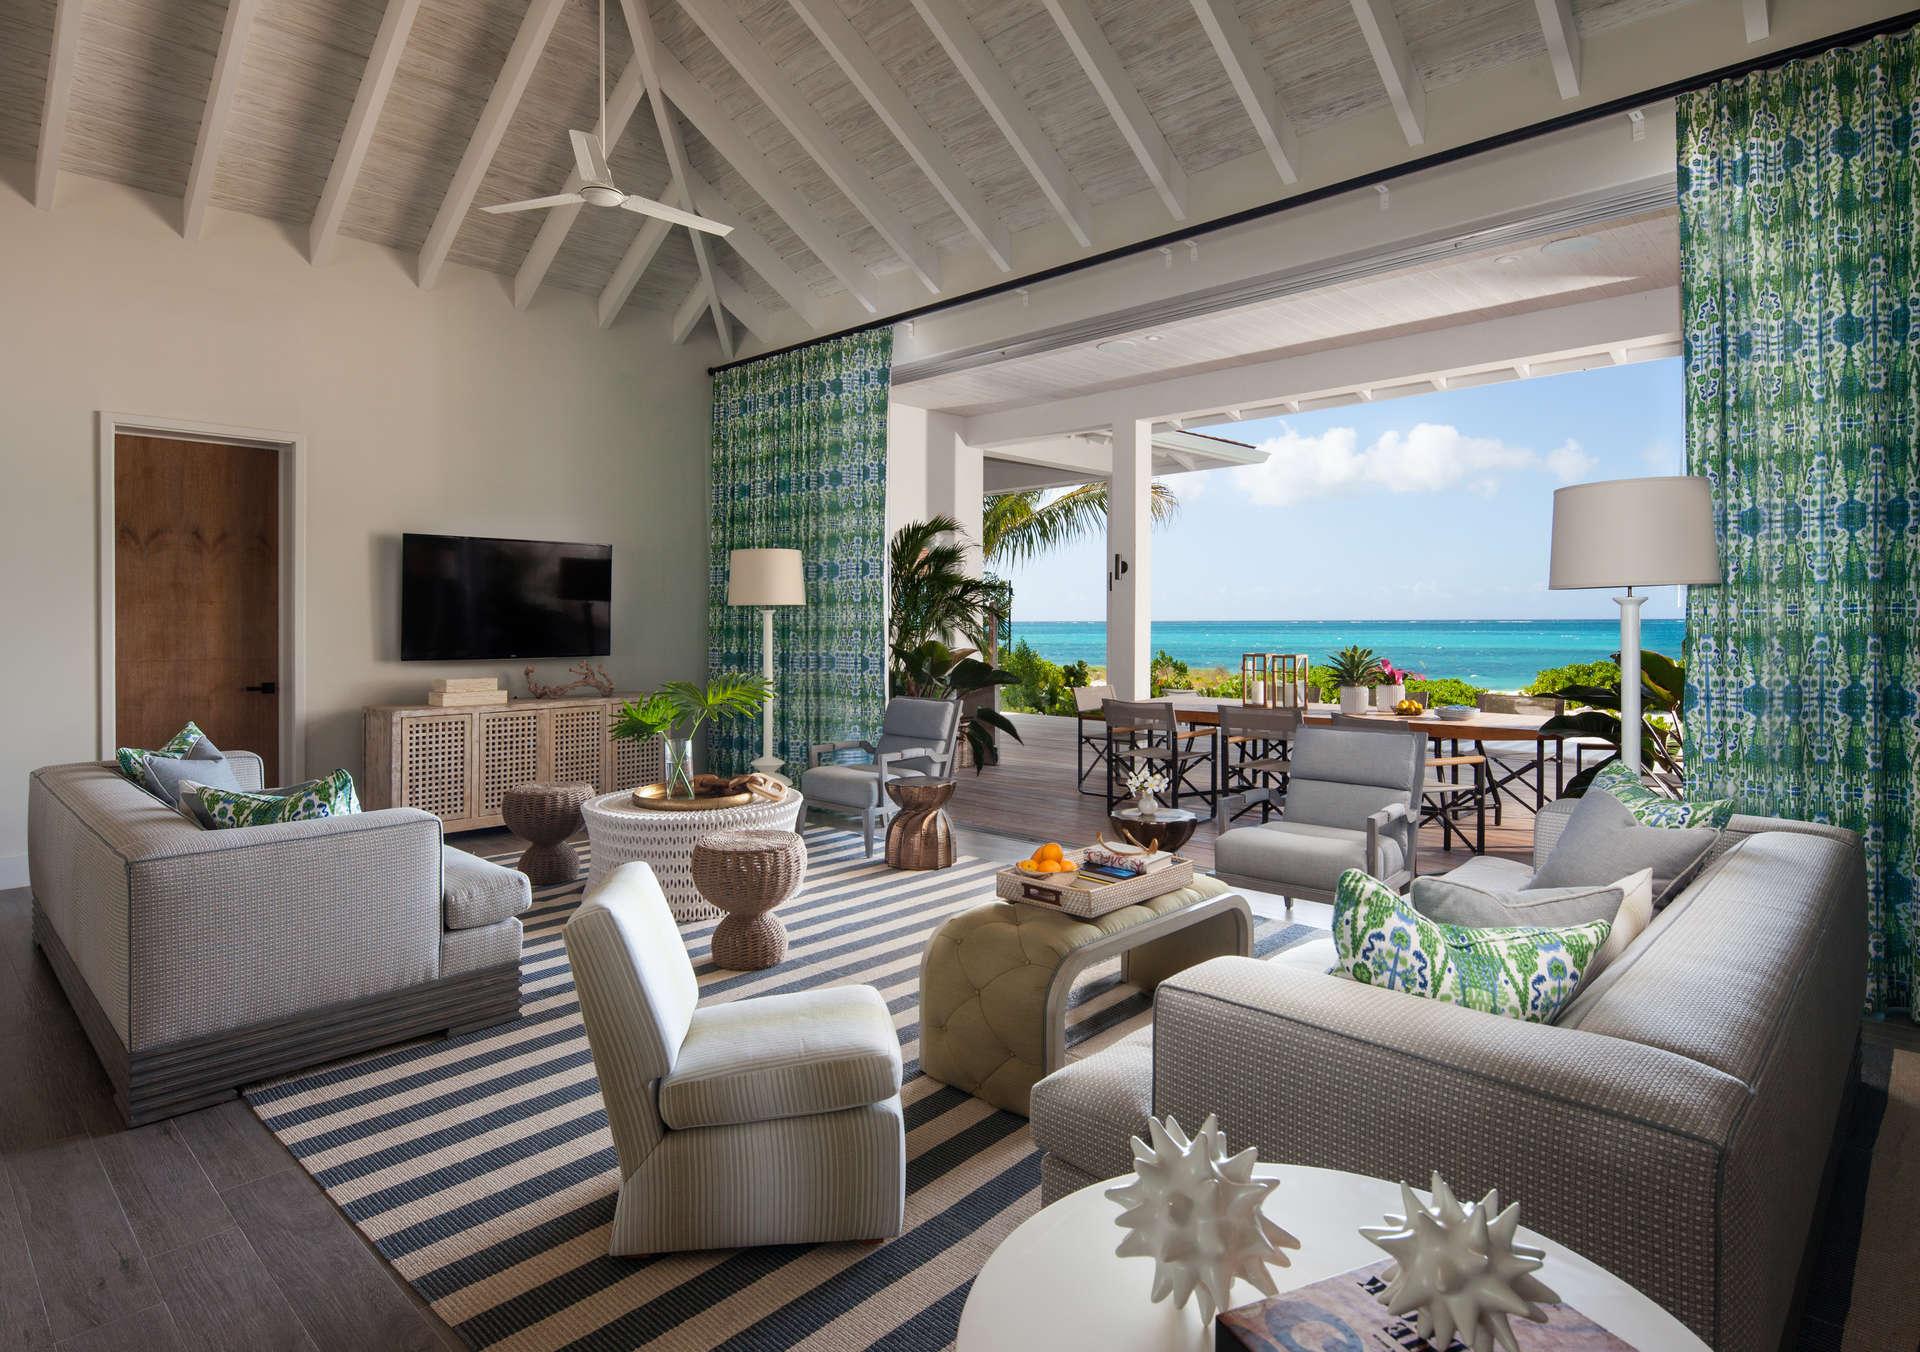 Luxury villa rentals caribbean - Turks and caicos - Providenciales - Grace bay club - The Residences | Frangipani - Image 1/9